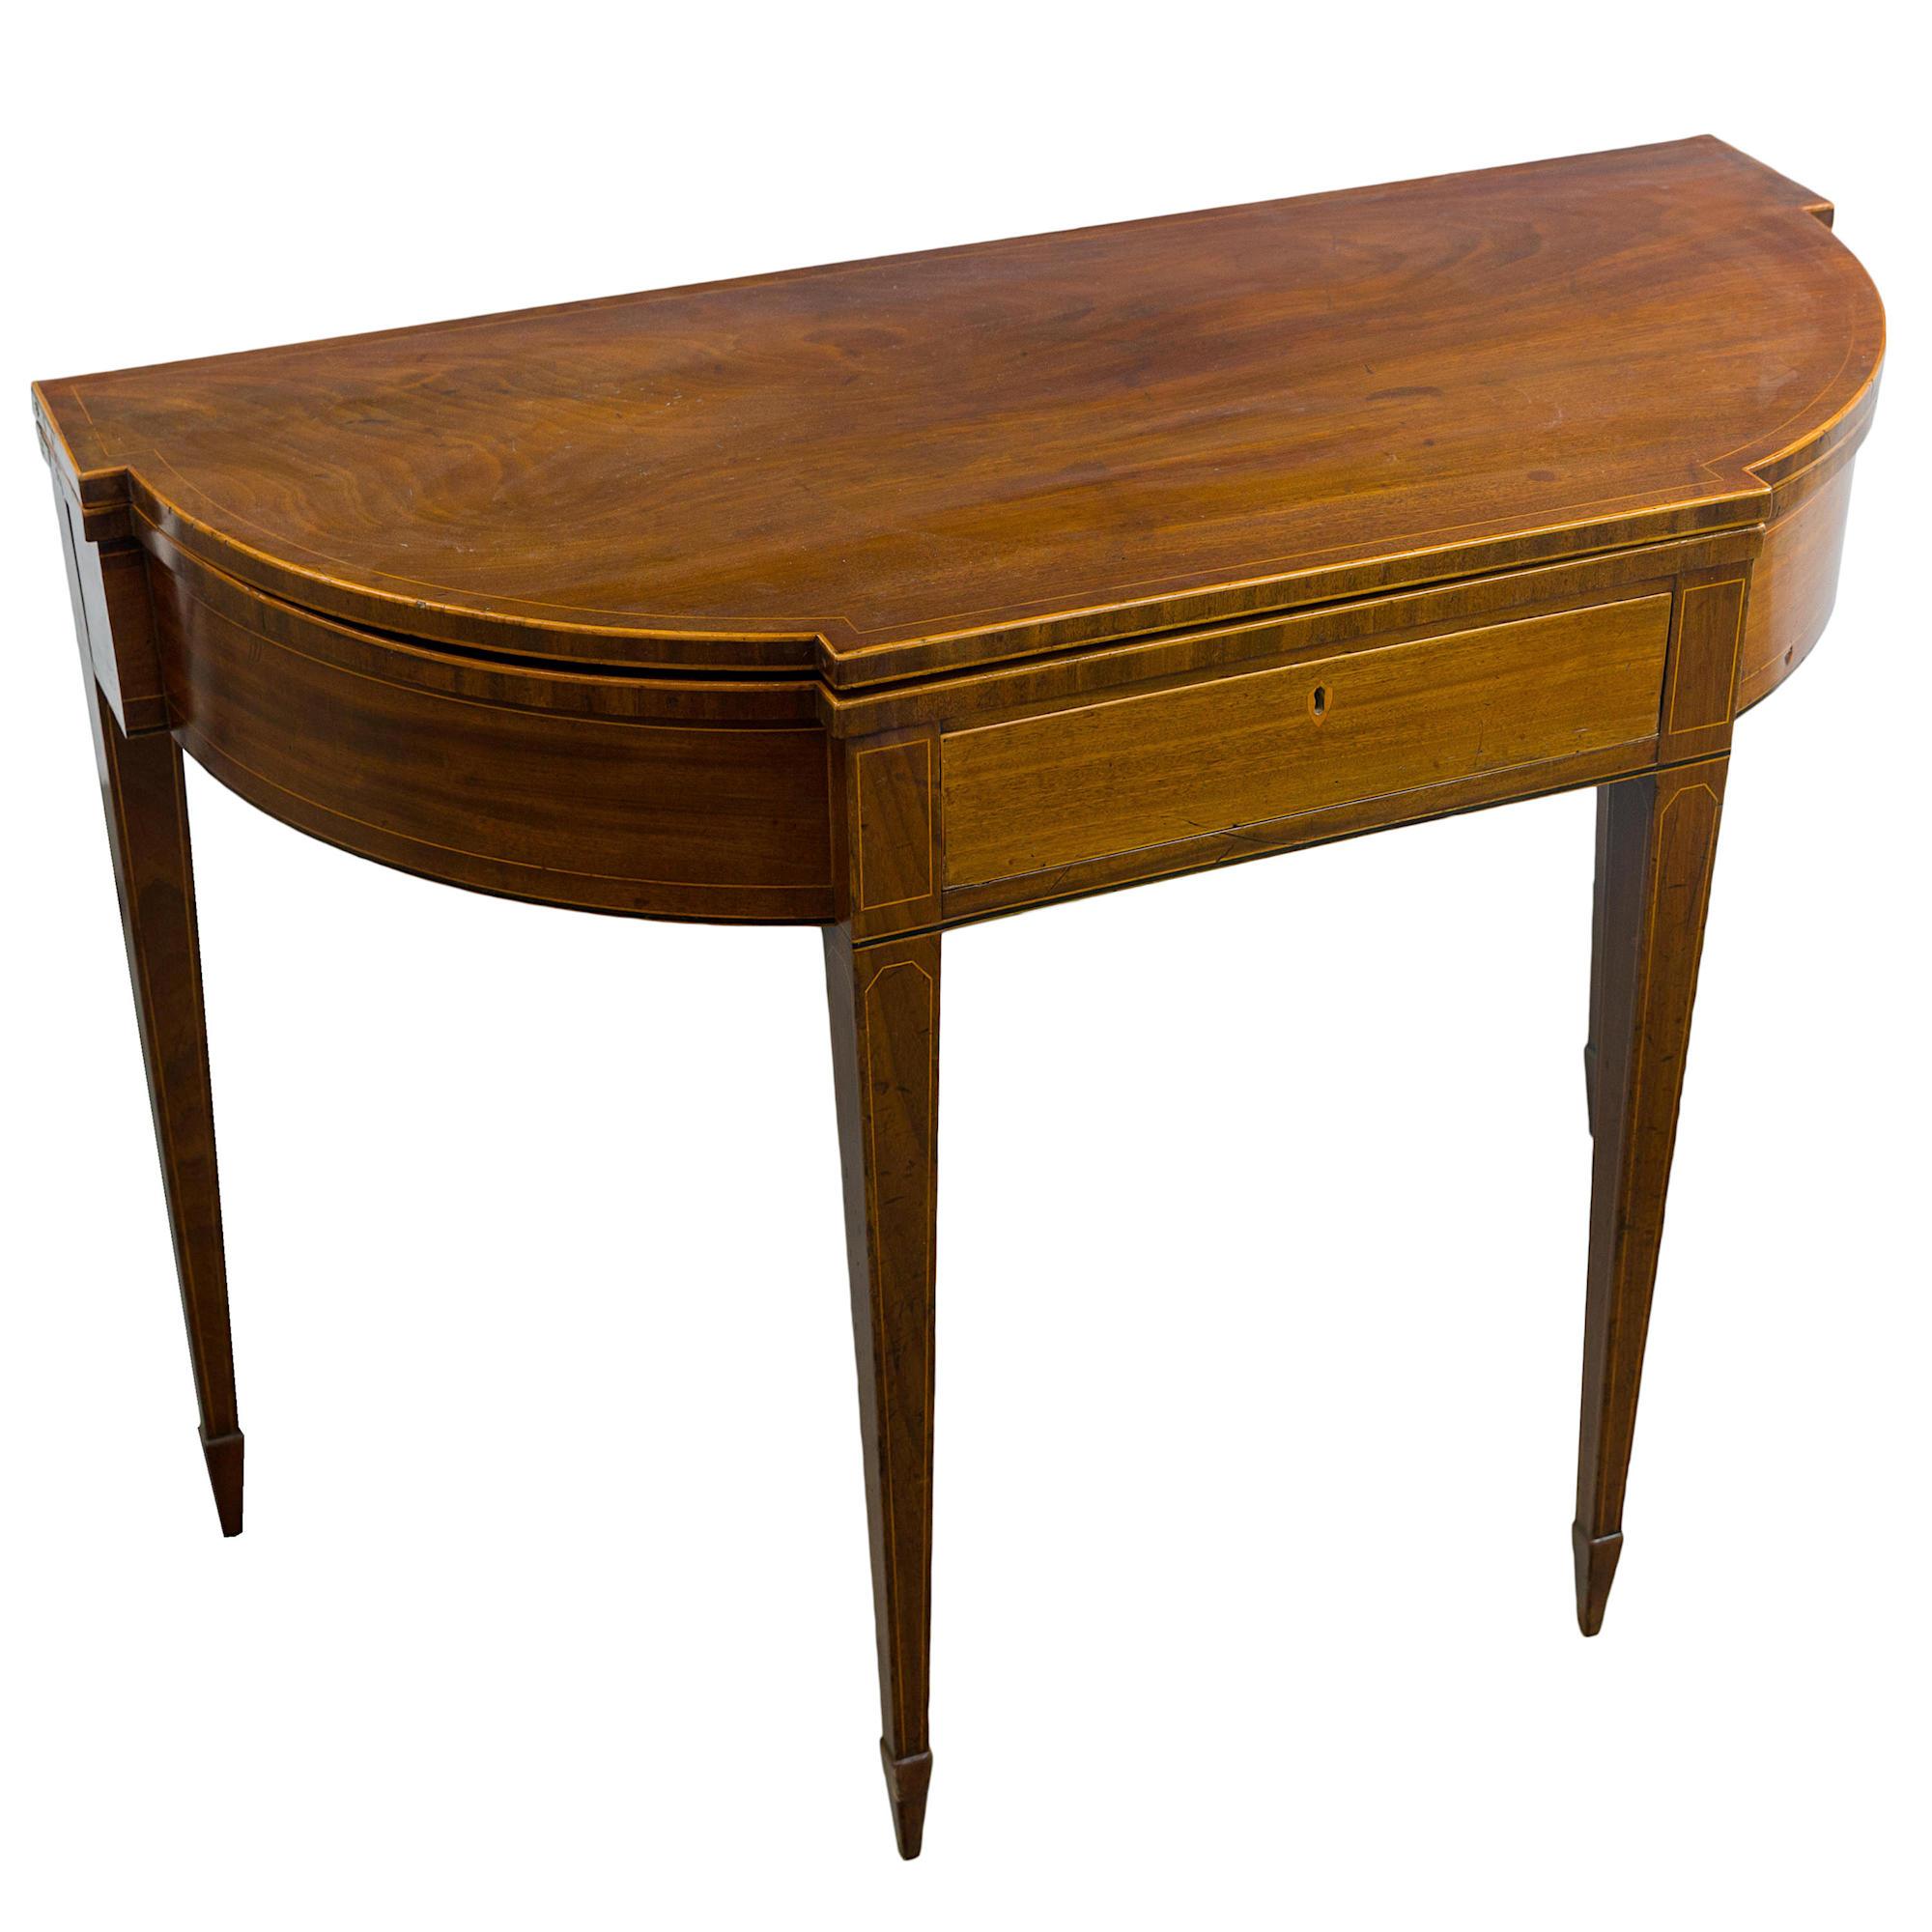 'George III Mahogany and String Inlaid Foldover Tea Table Circa 1800'